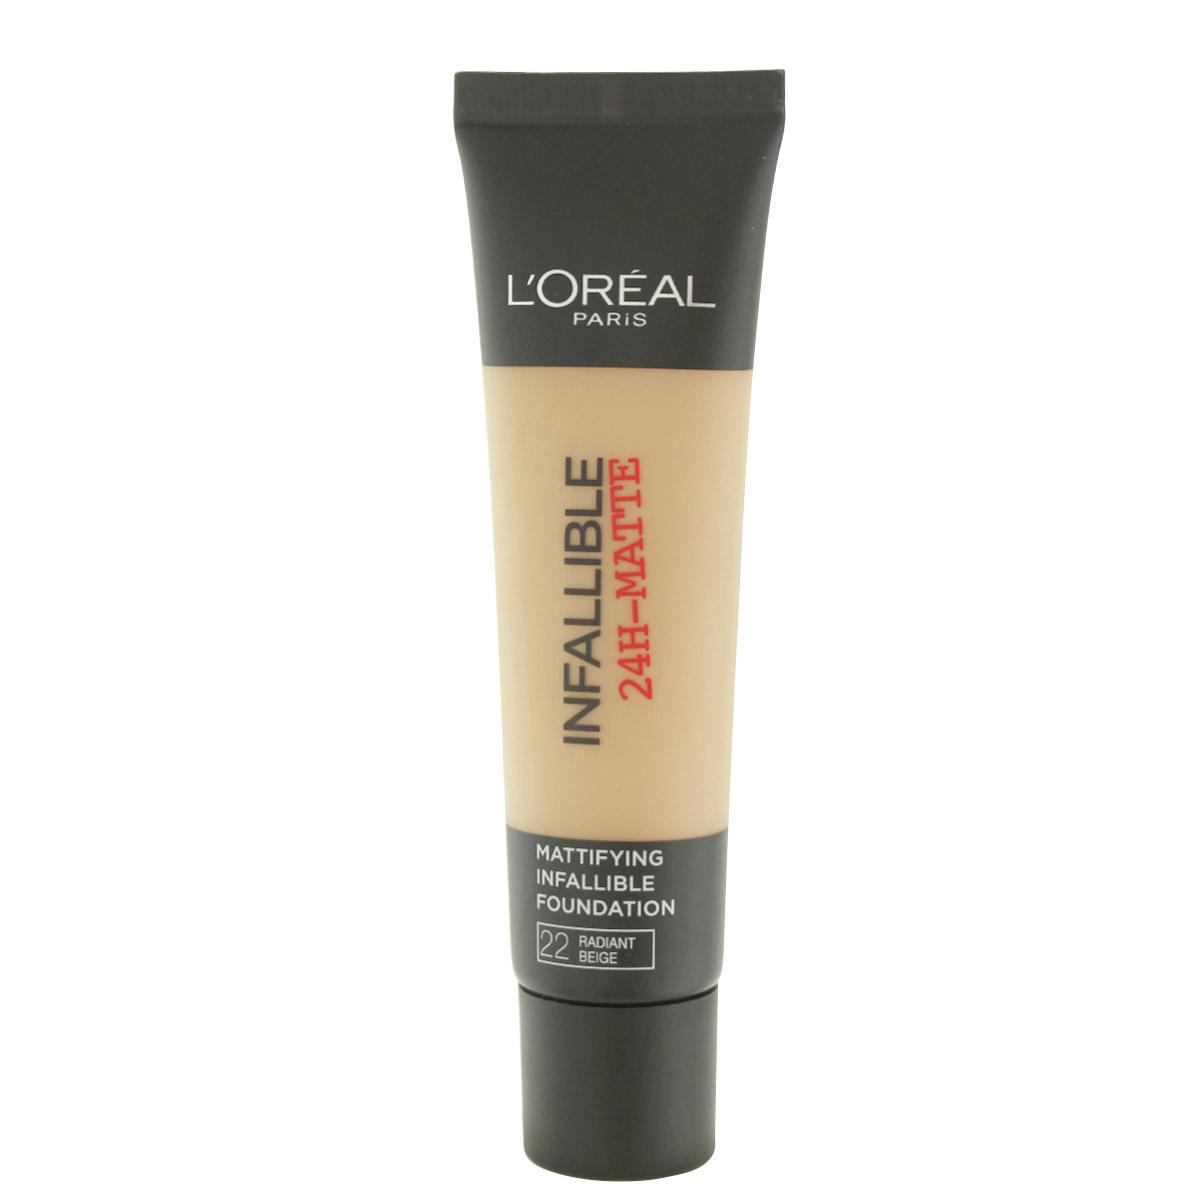 L´Oreal Paris Infallible 24H-Matte make-up (22 Radiant Beige) 30 ml